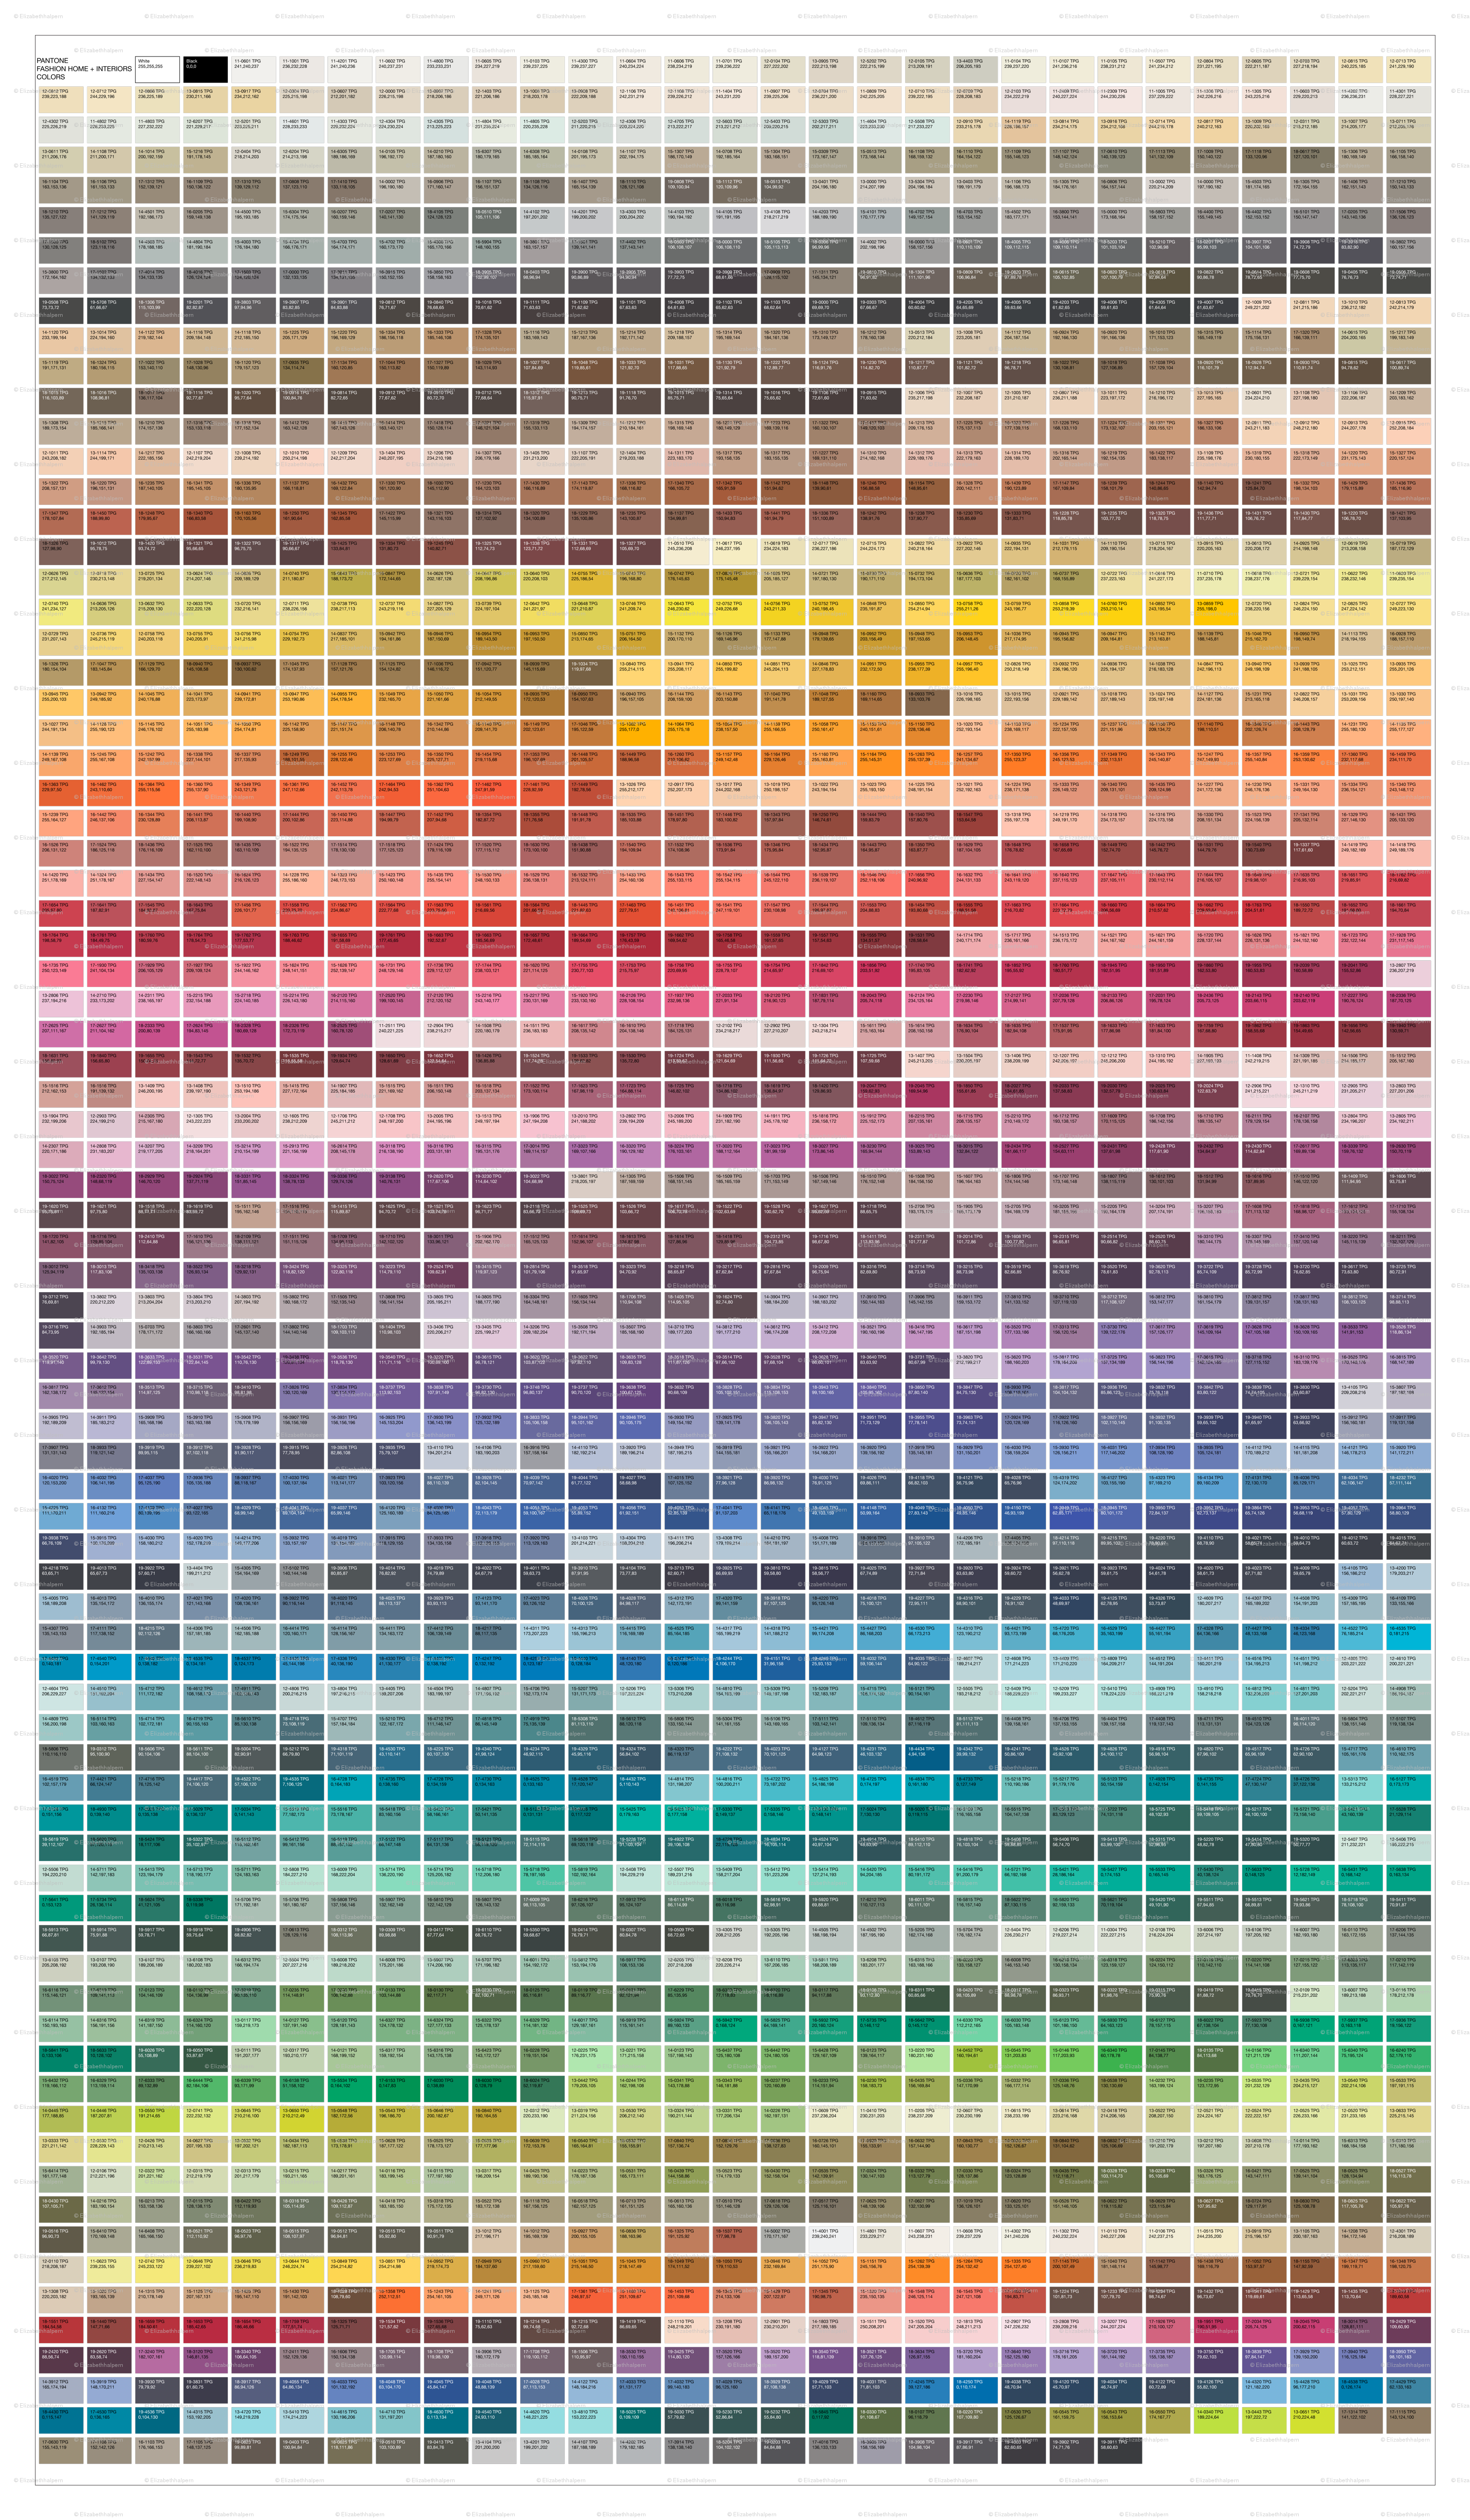 PANTONE Fashion Home + Interiors Color Guide Wallpaper   Elizabethhalpern    Spoonflower